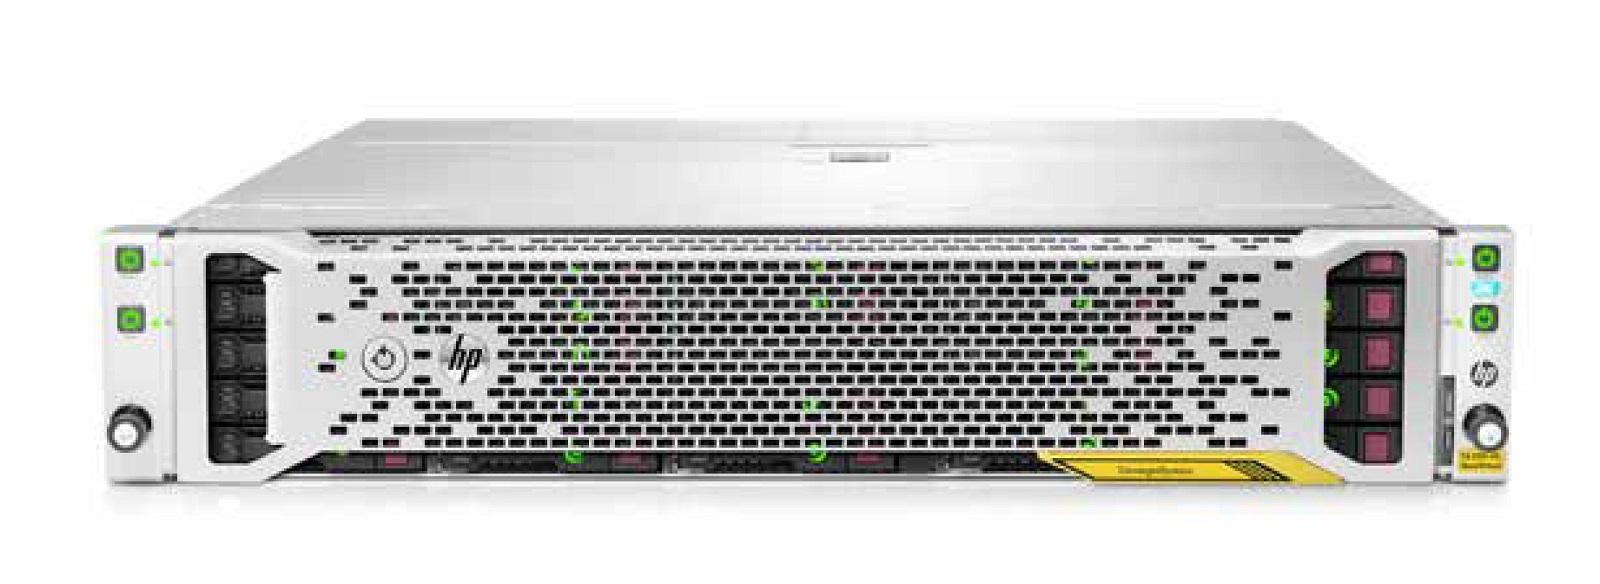 HP超融合系统CS250解析:计算架构